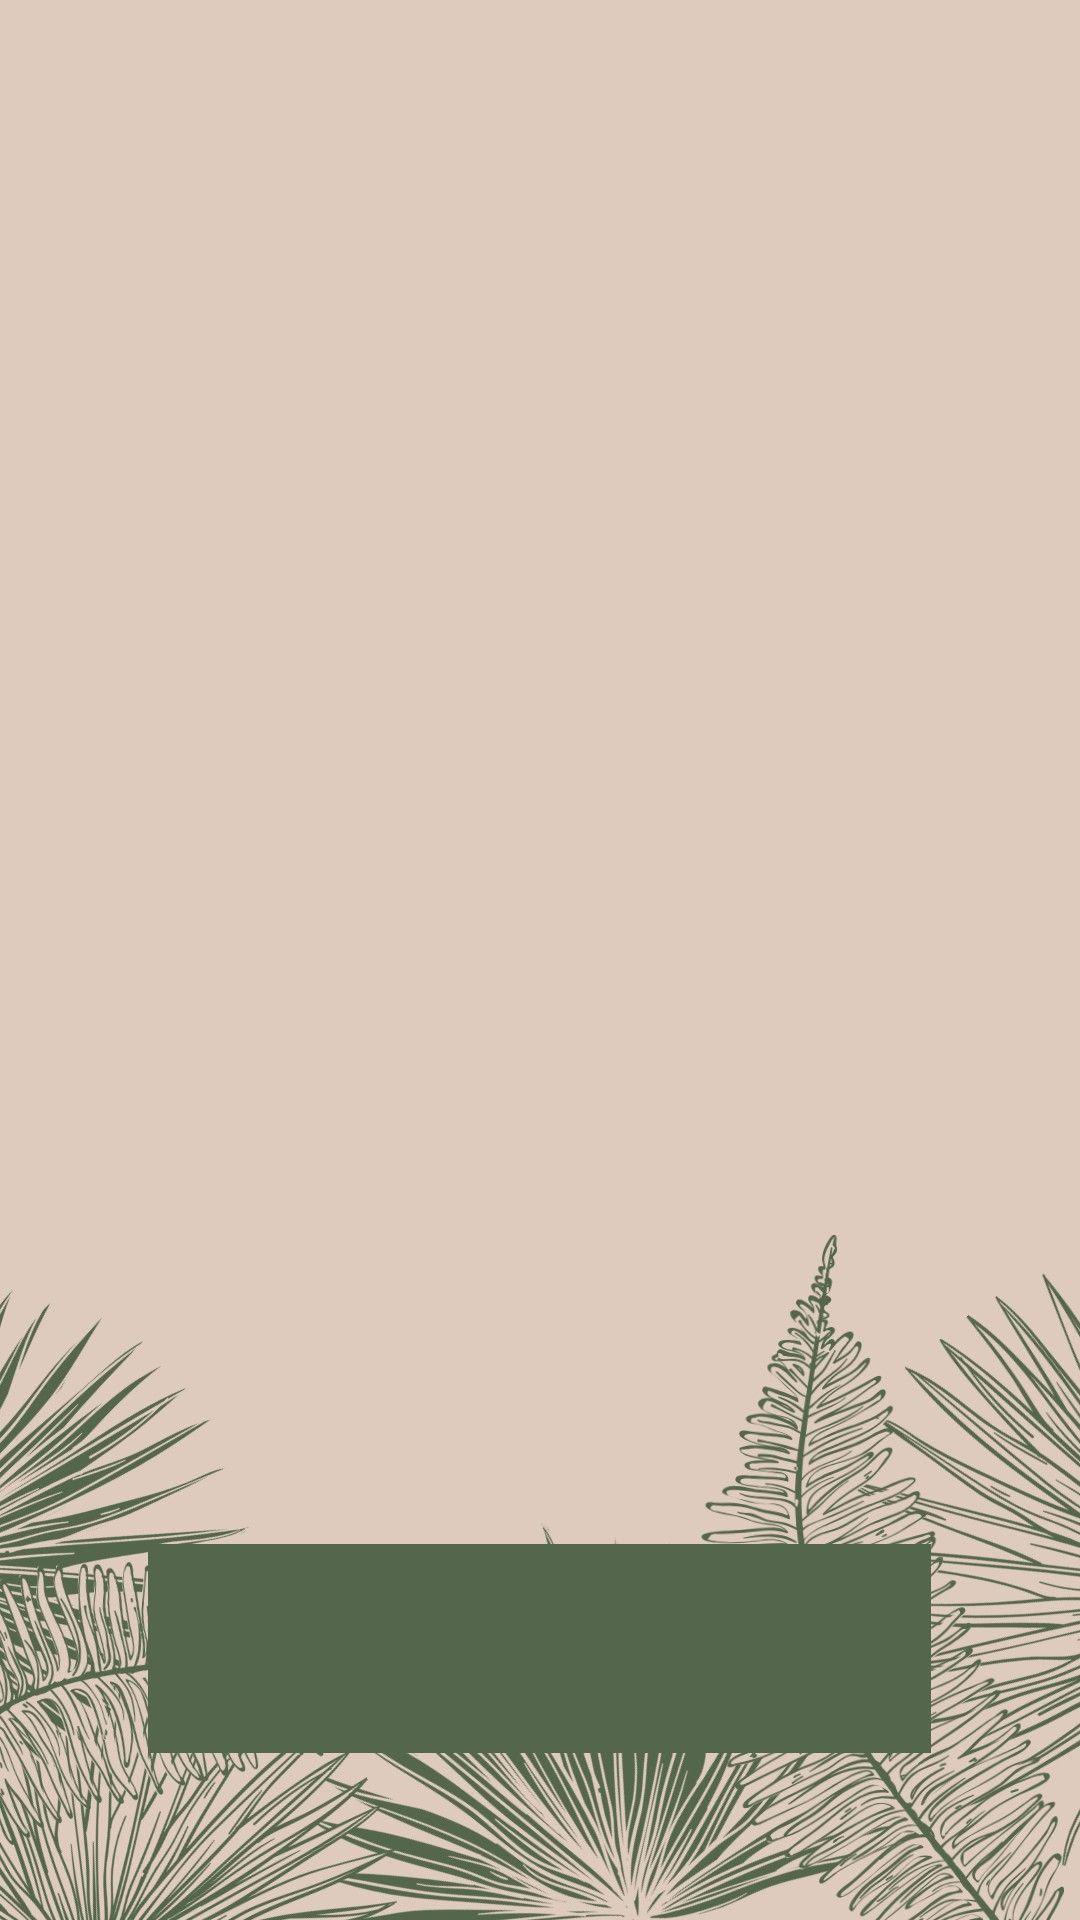 Free Instagram Template Gratis Templates Para Stories Floral Background Em 2020 Moldura Para Instagram Template Instagram Cartazes Criativos